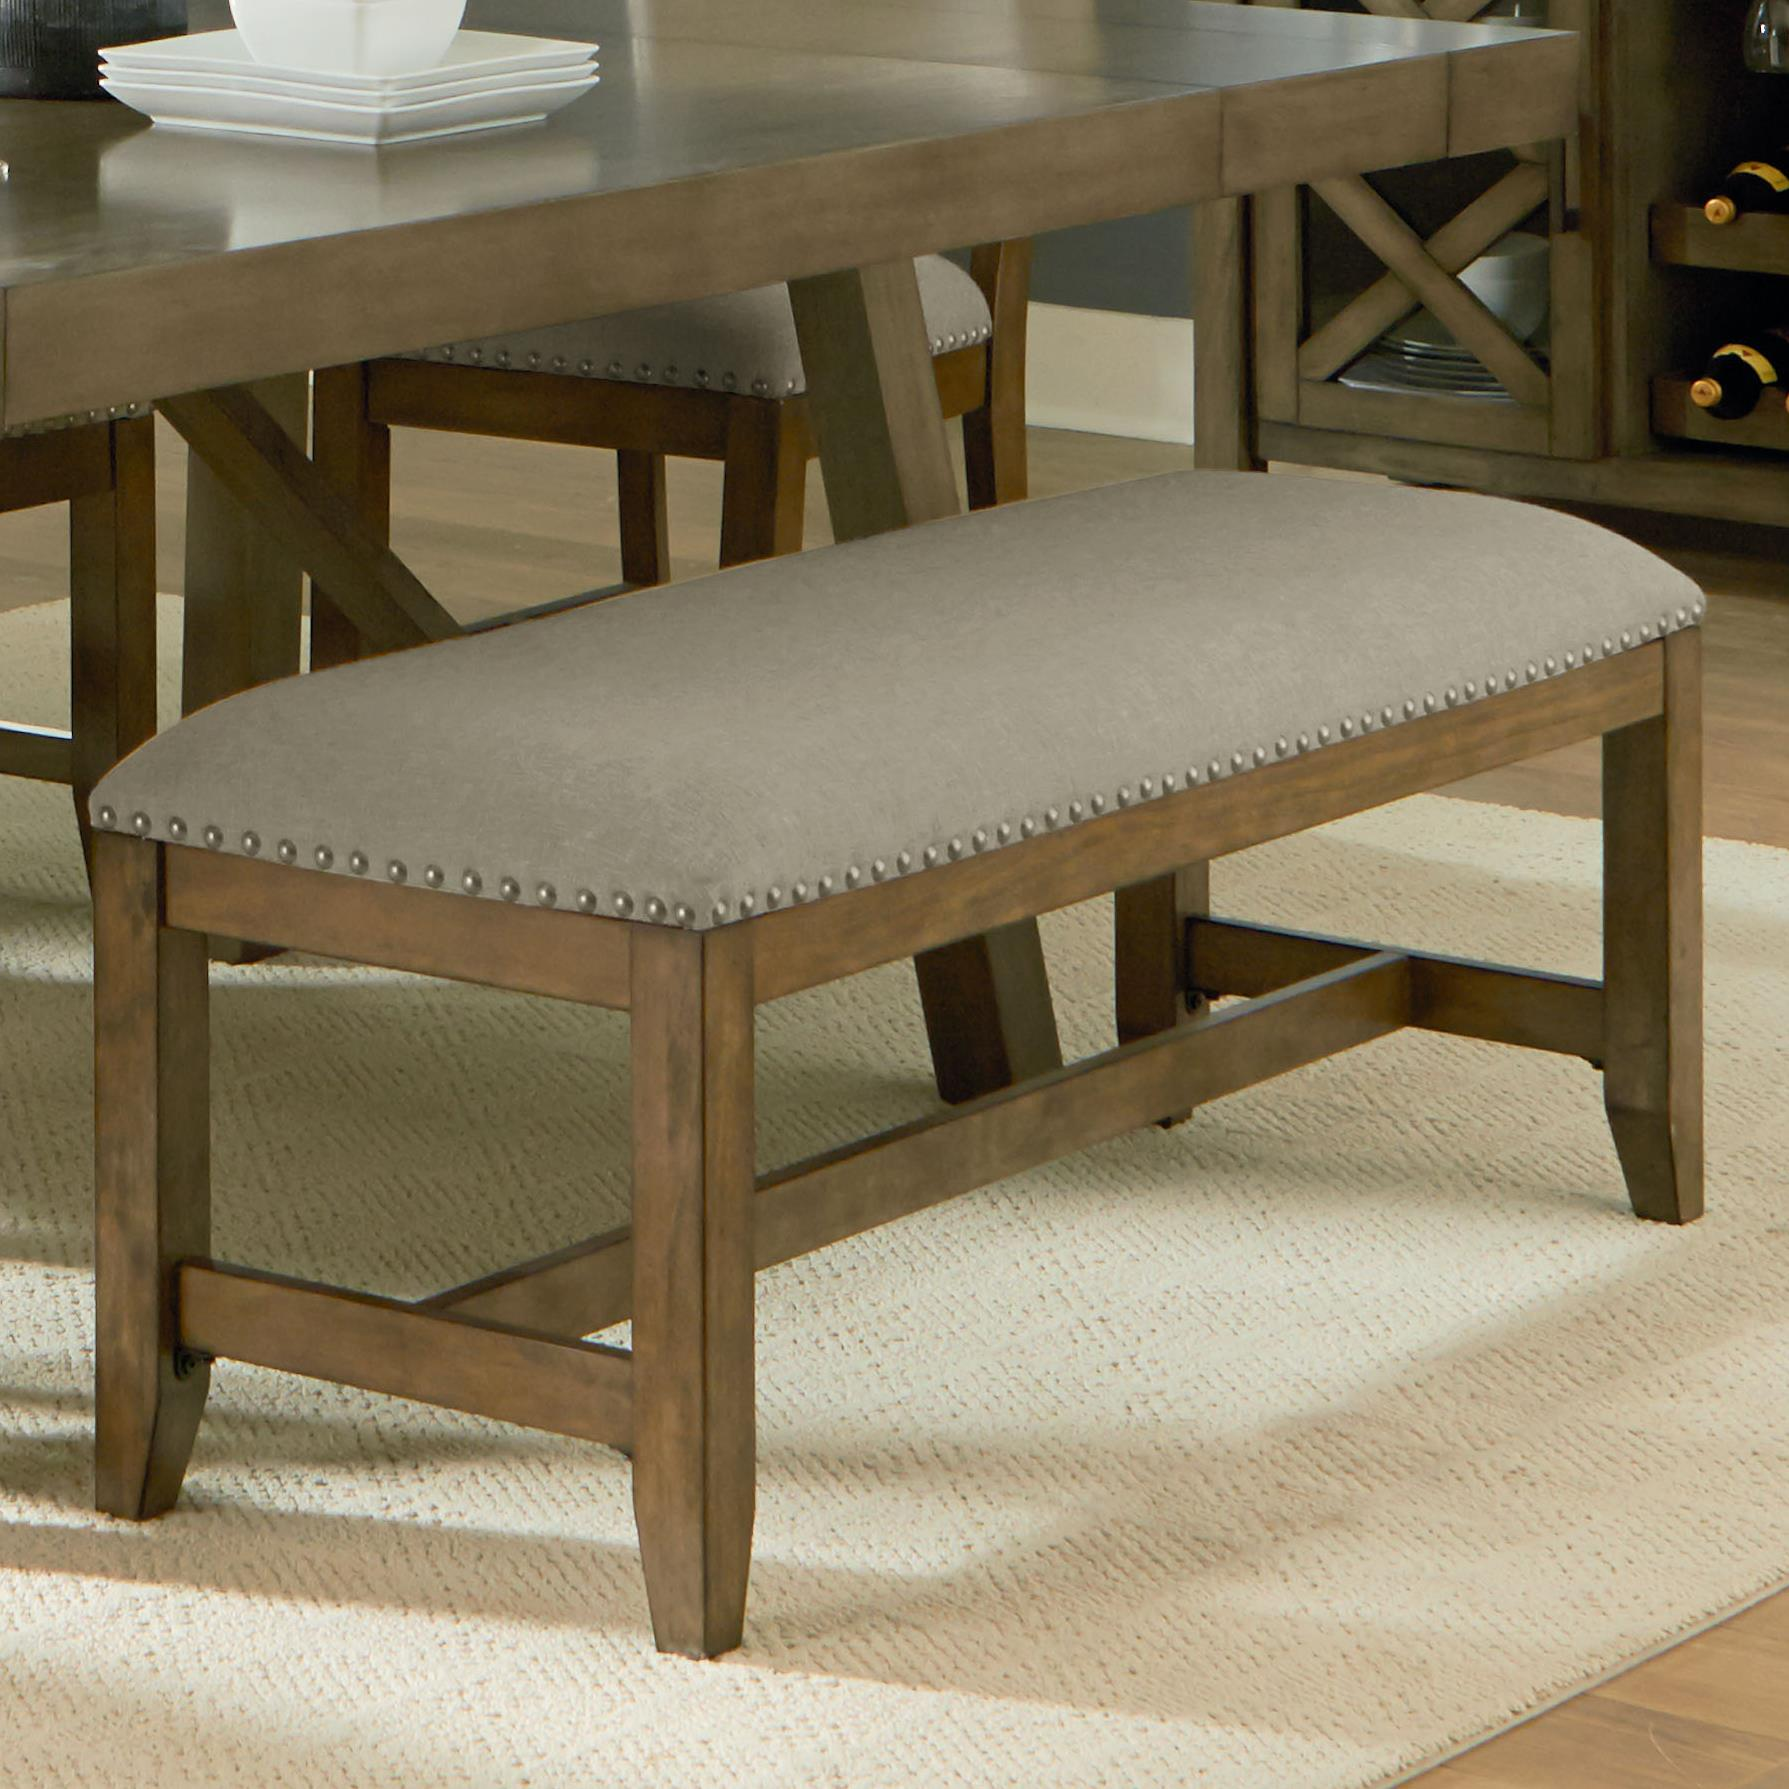 Standard Furniture Omaha Grey Dining Bench - Item Number: 16688